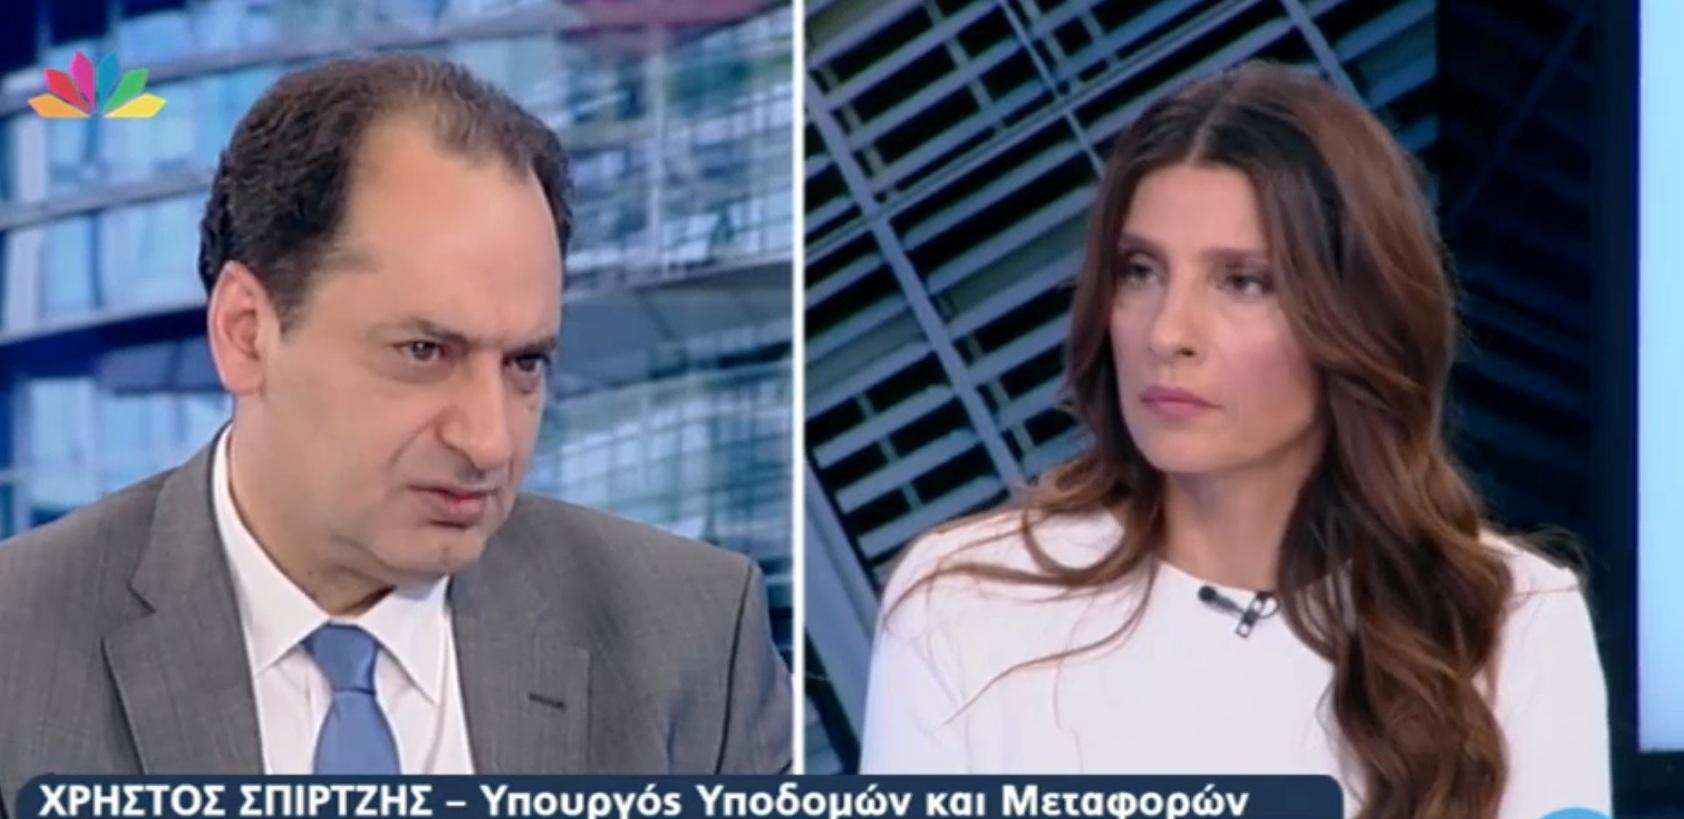 O διάλογος της Τσαπανίδου με τον Σπίρτζη για τη σύνδεση του Αγρινίου με την Ιόνια Οδό